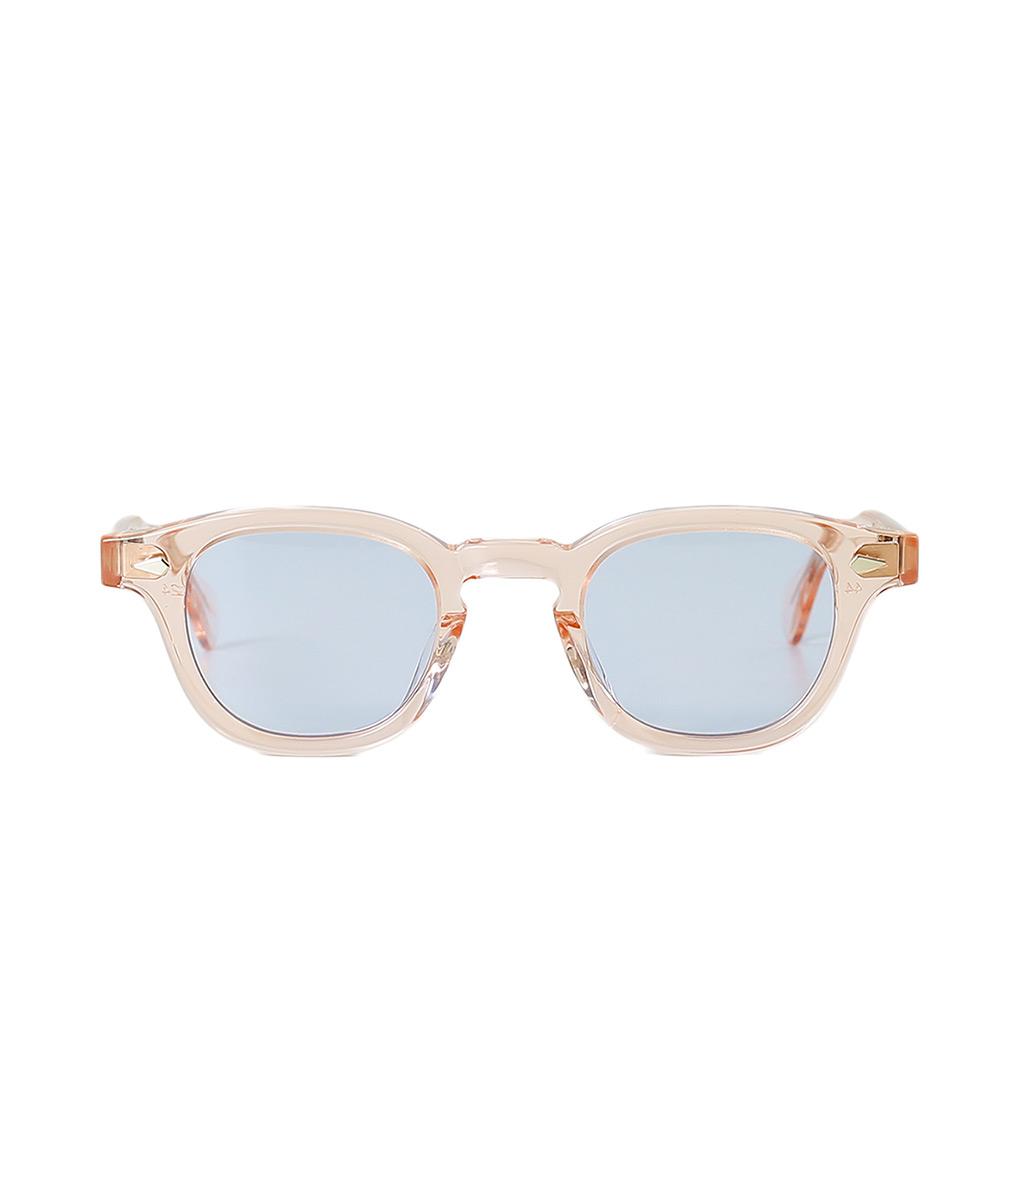 JULIUS TART OPTICAL / ジュリアスタートオプティカル : AR 44 46-24 - FRESH PINK / LIGHT BLUE - : サングラス アクセサリー メガネ 眼鏡 : JTPL-101H-T-2H-T-wise【WIS】